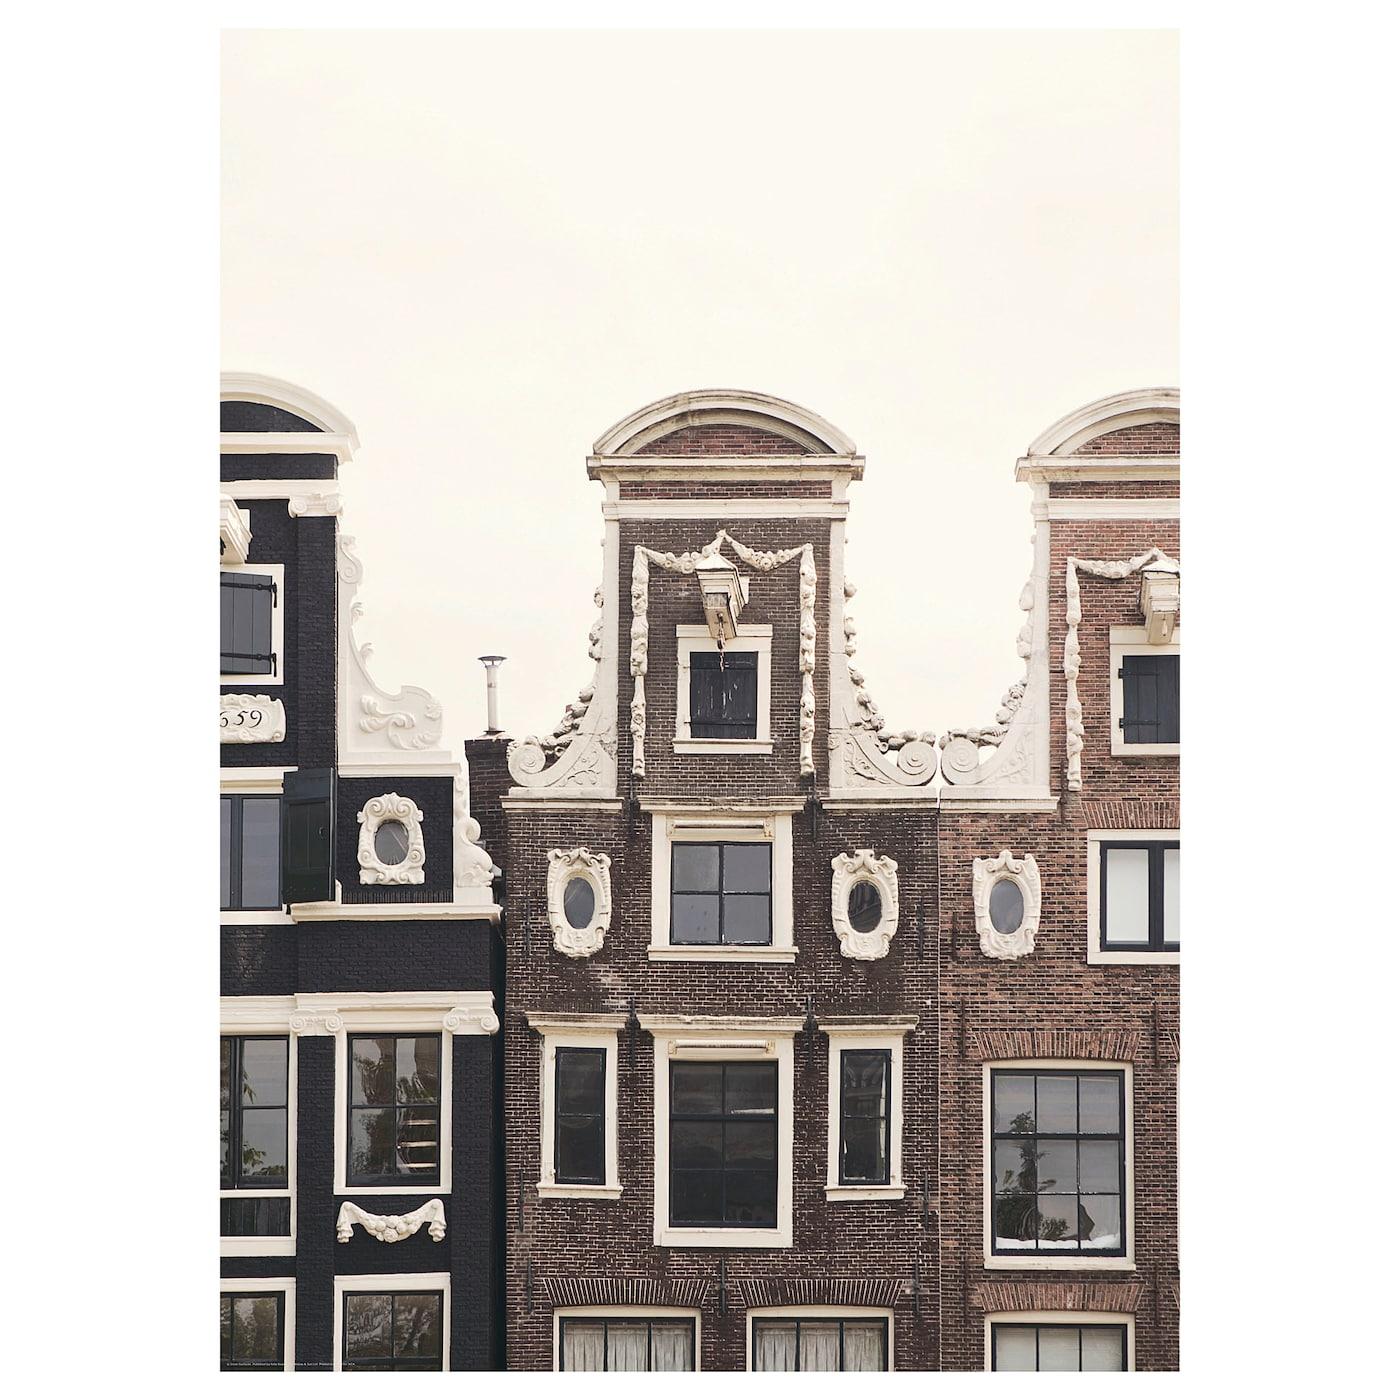 bild poster aerial amsterdam ii 50 x 70 cm ikea. Black Bedroom Furniture Sets. Home Design Ideas